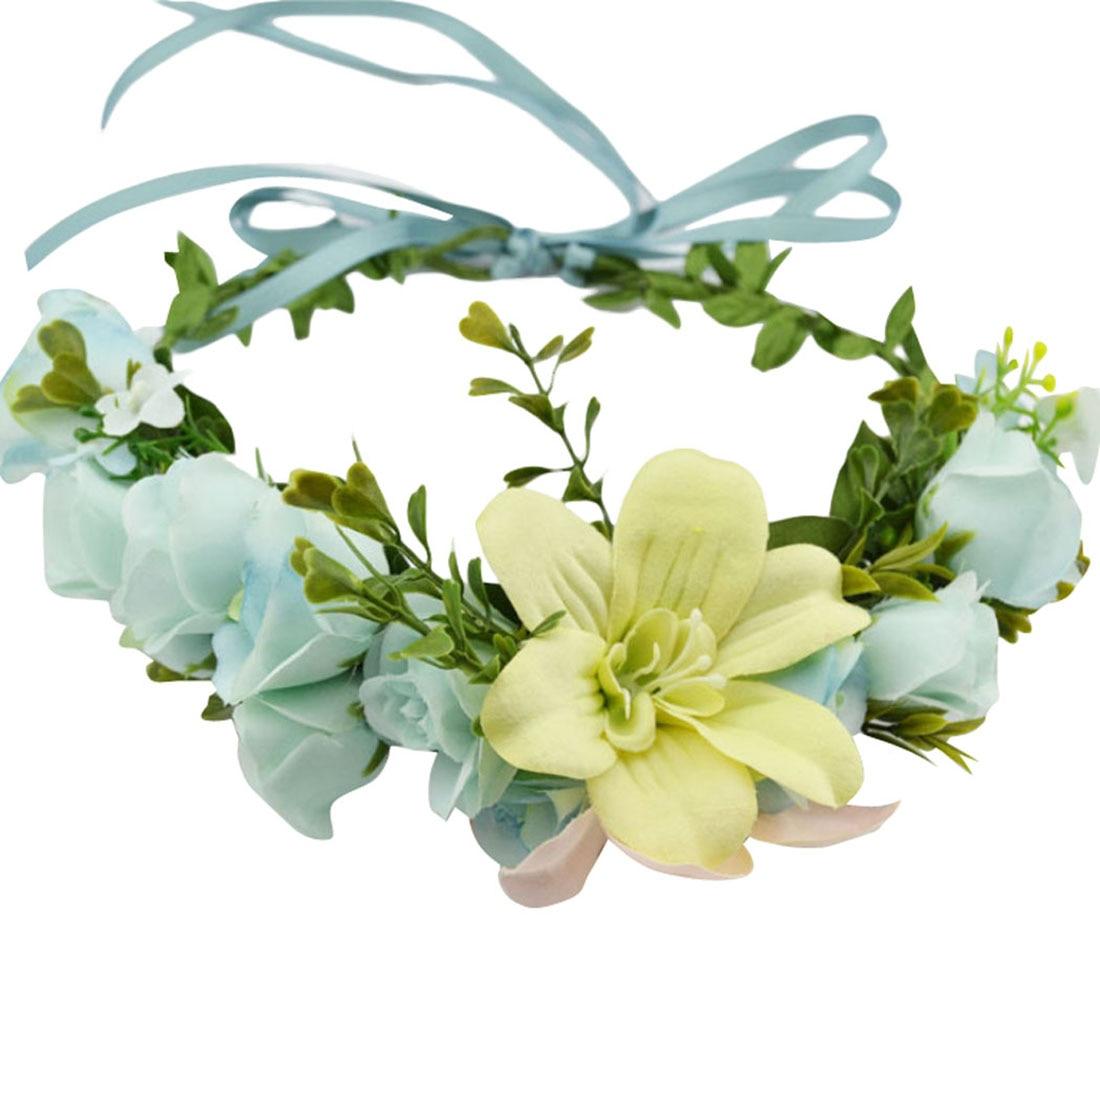 Zebery Wedding Flower Ribbons Lily Flower Wreath Crown Headband Bridesmaid Bridal Headwear Wreath Party Hair Props